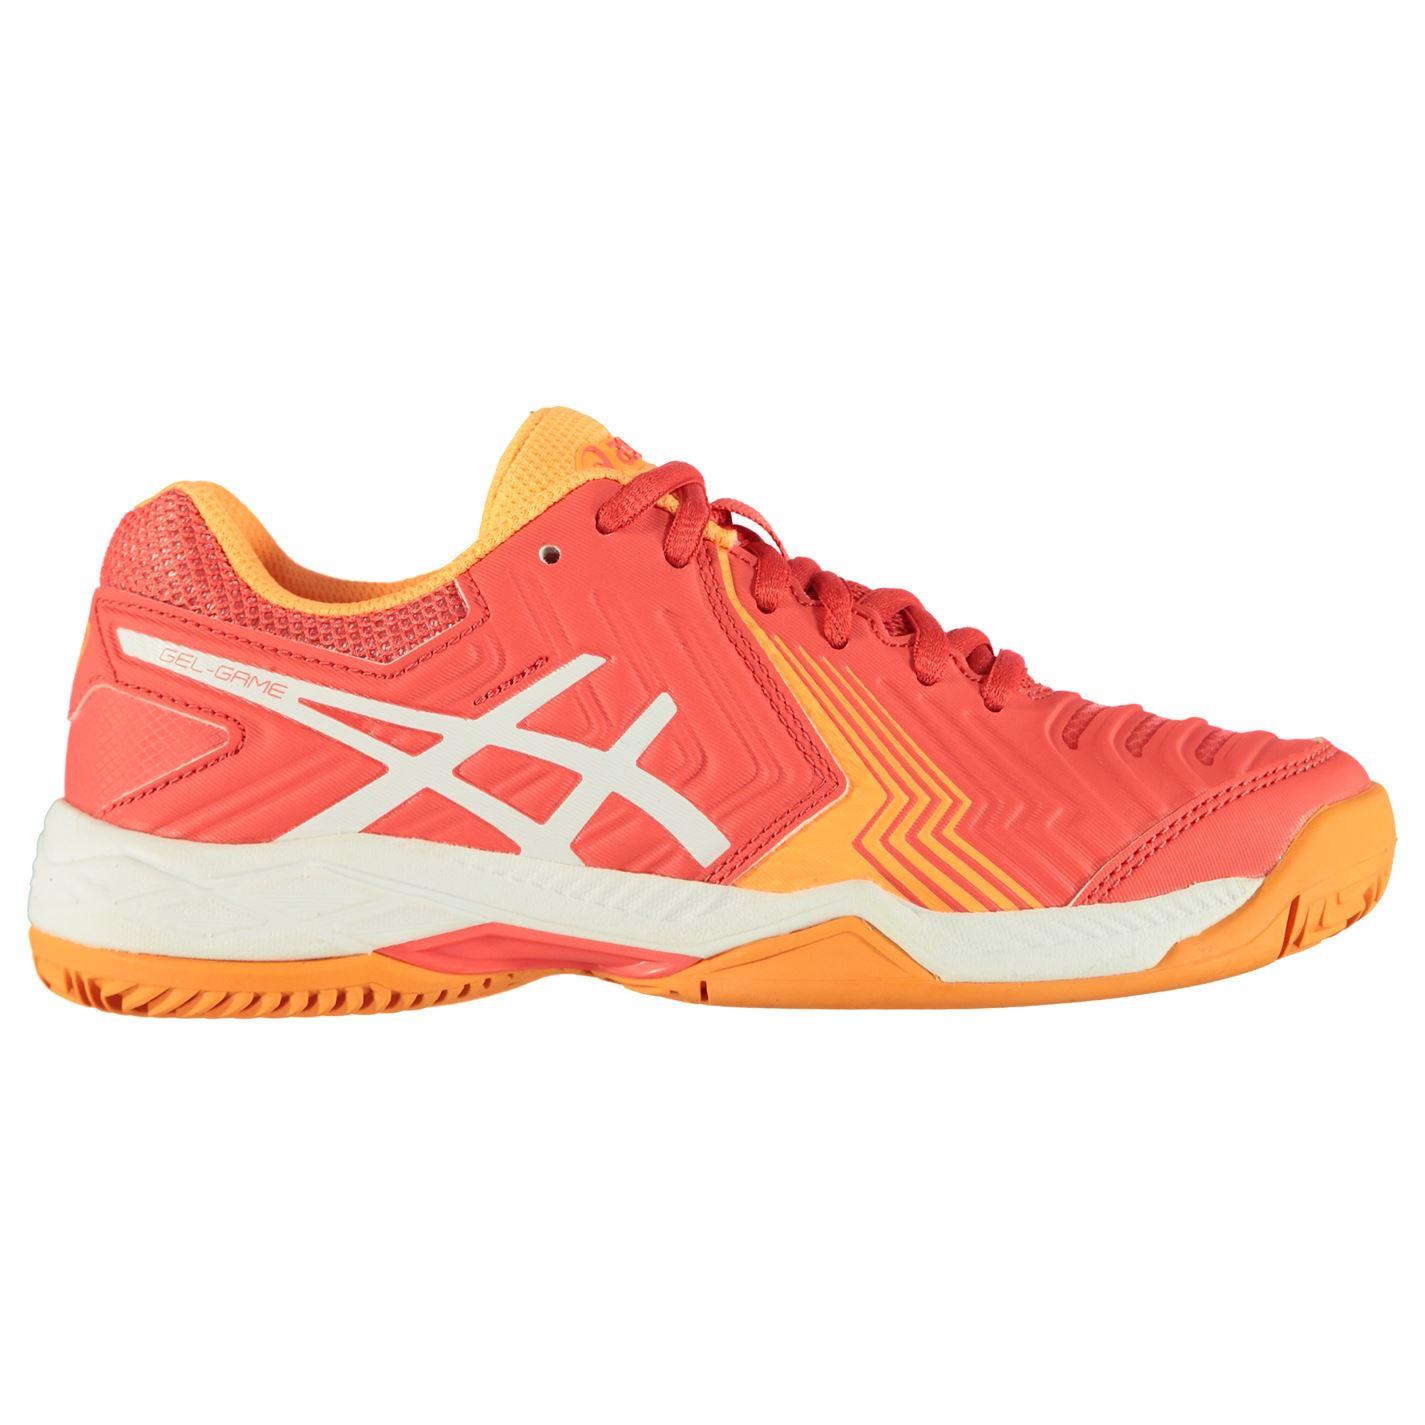 Asics GEL Game 6 Clay Ladies Tennis Shoes